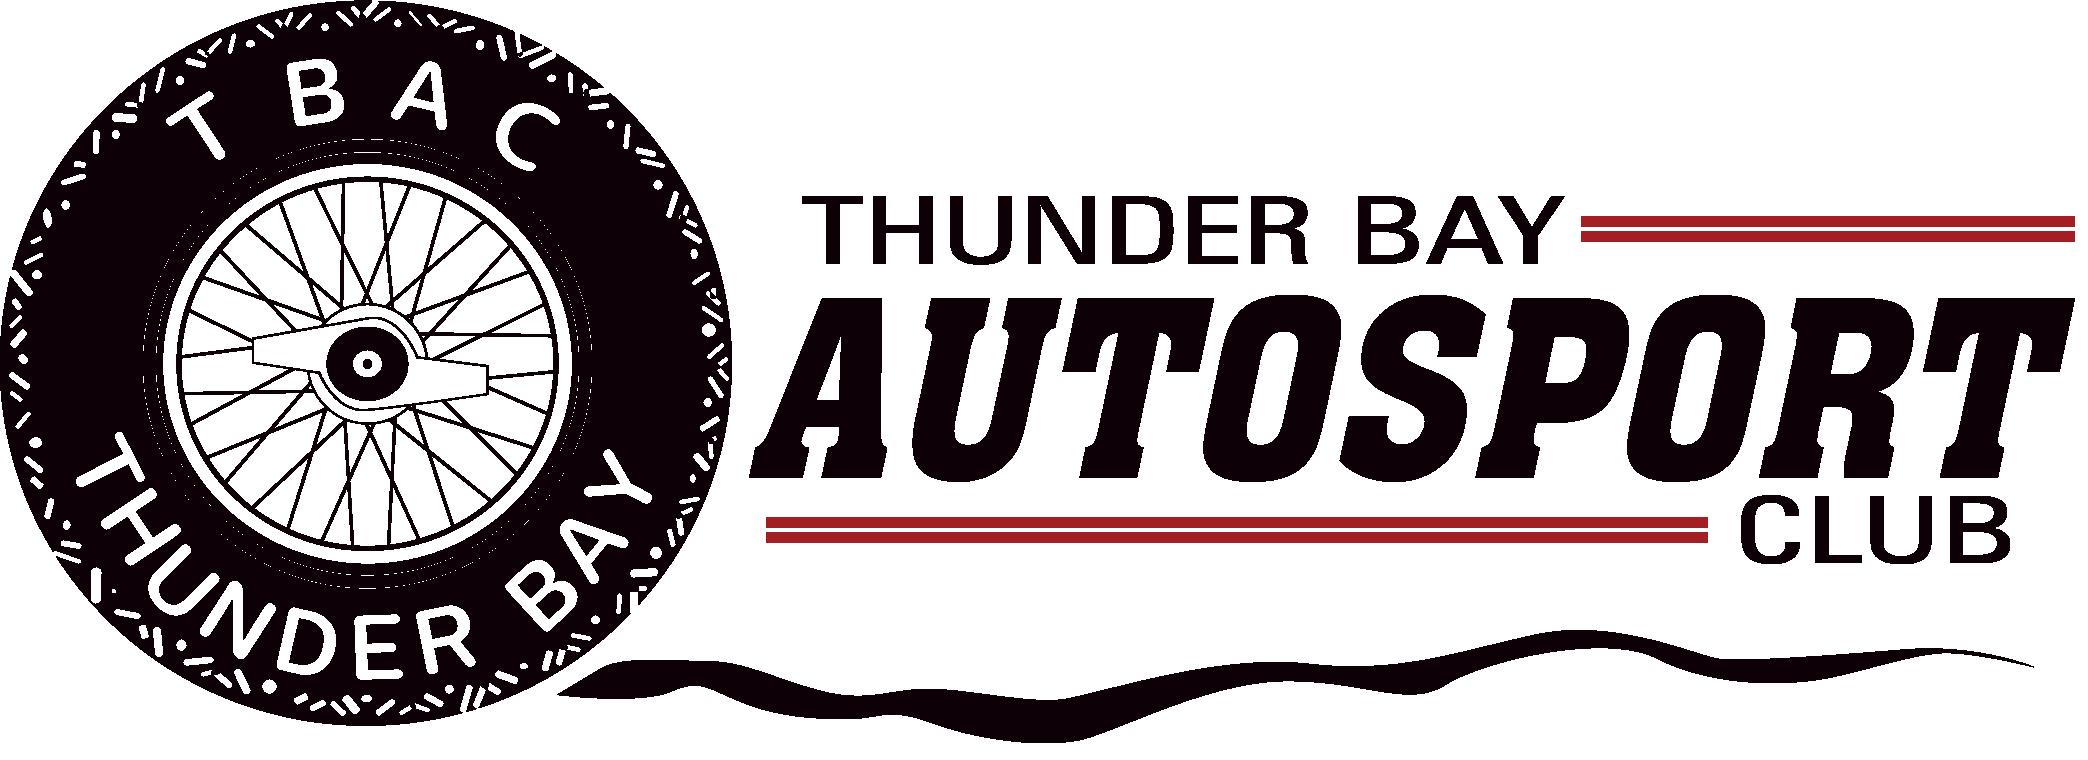 Thunder Bay Autosports Club